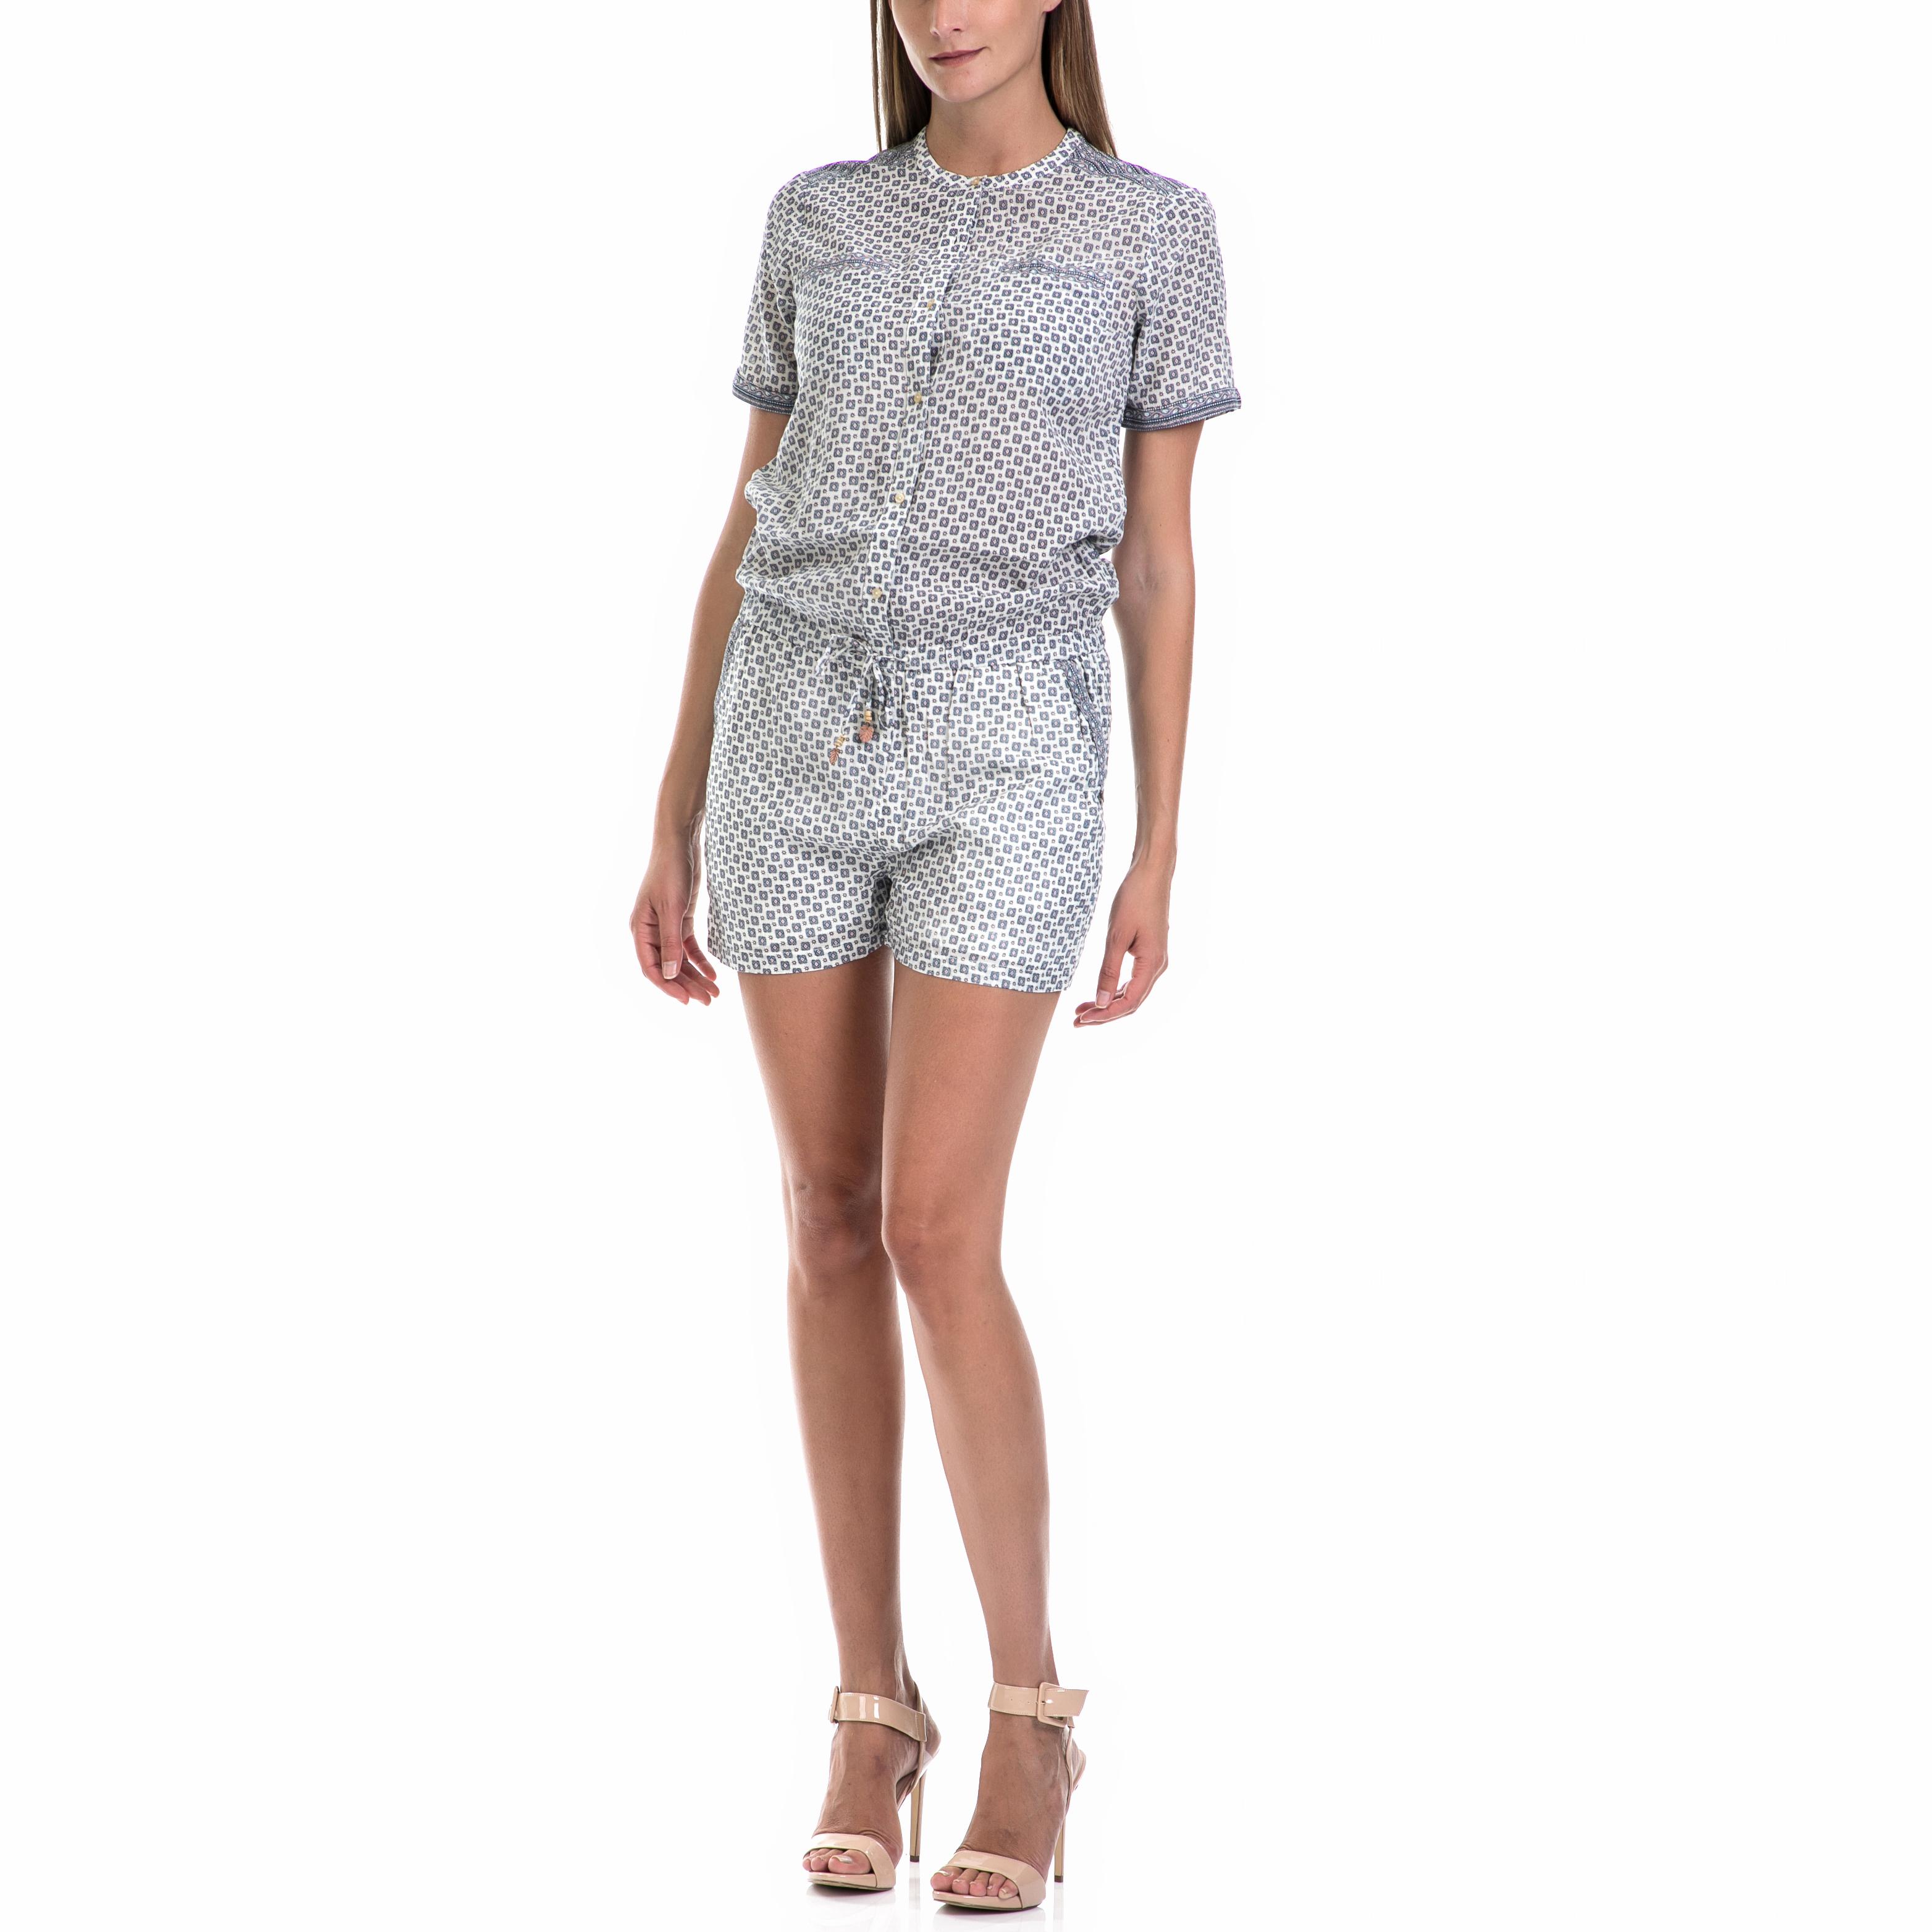 MAISON SCOTCH – Γυναικεία ολόσωμη φόρμα MAISON SCOTCH άσπρη-μπλε